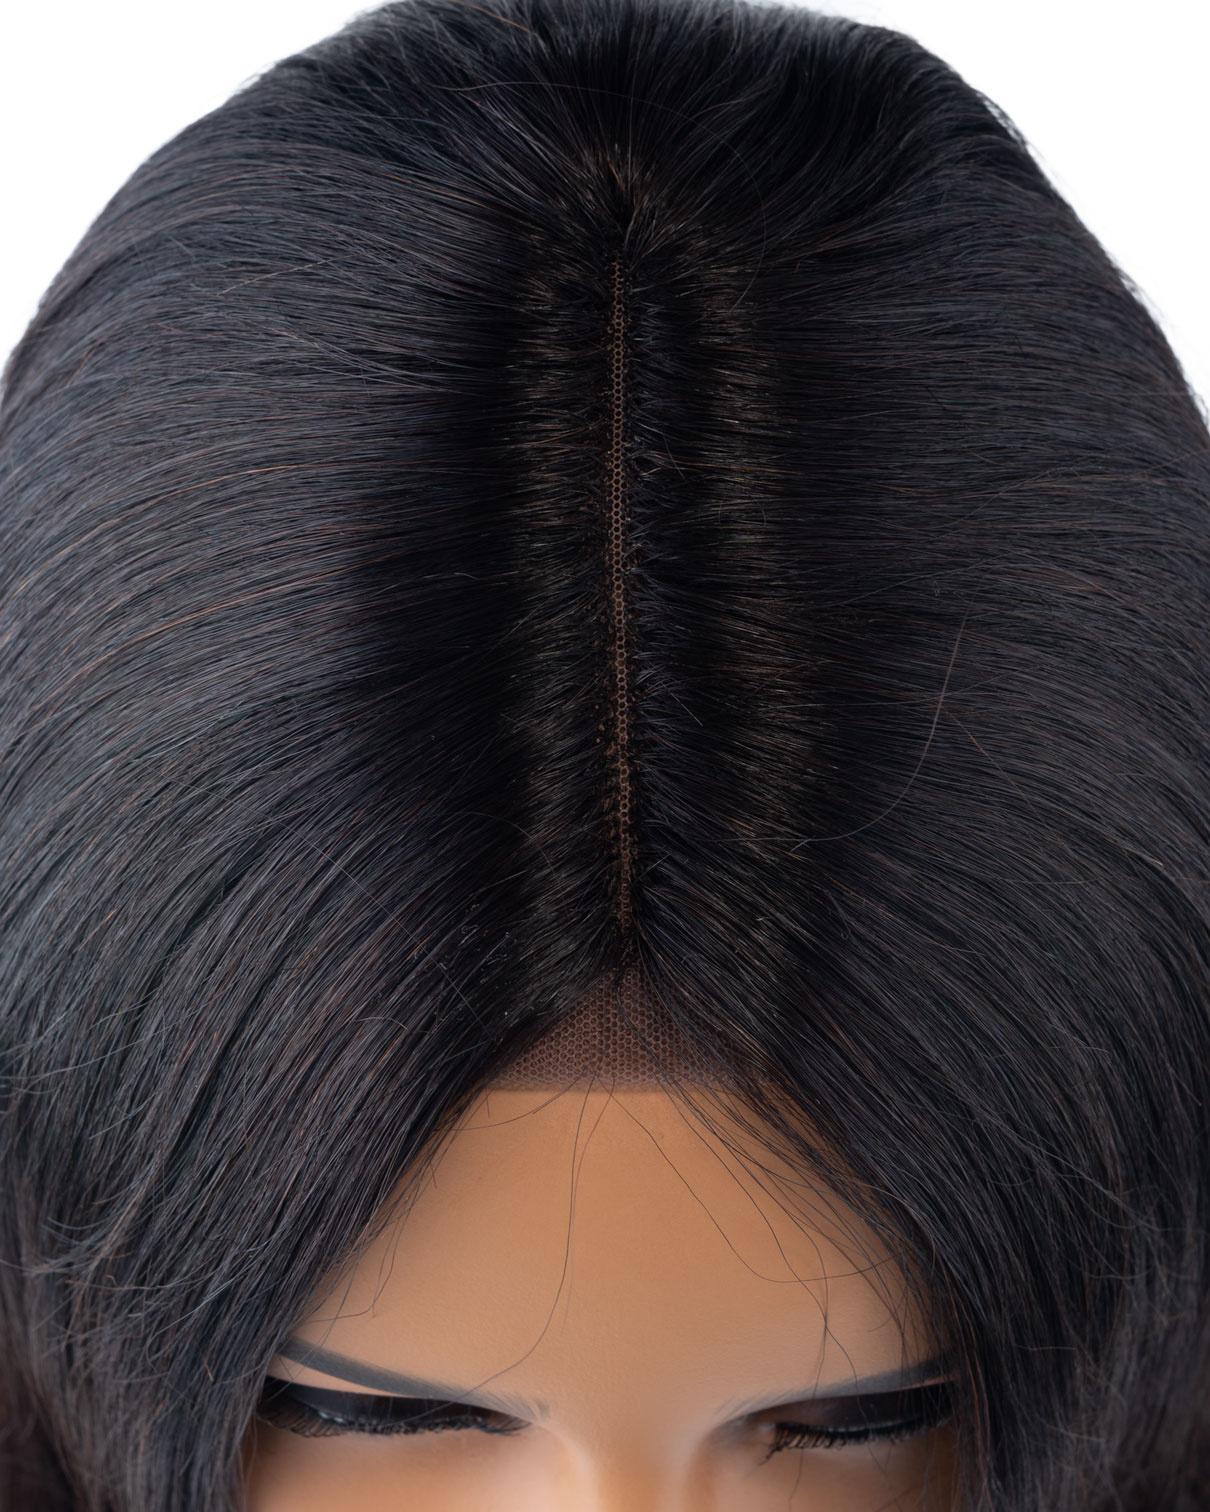 Shri SilverFox Indian Shri Front Lace Wig - BOB -10''